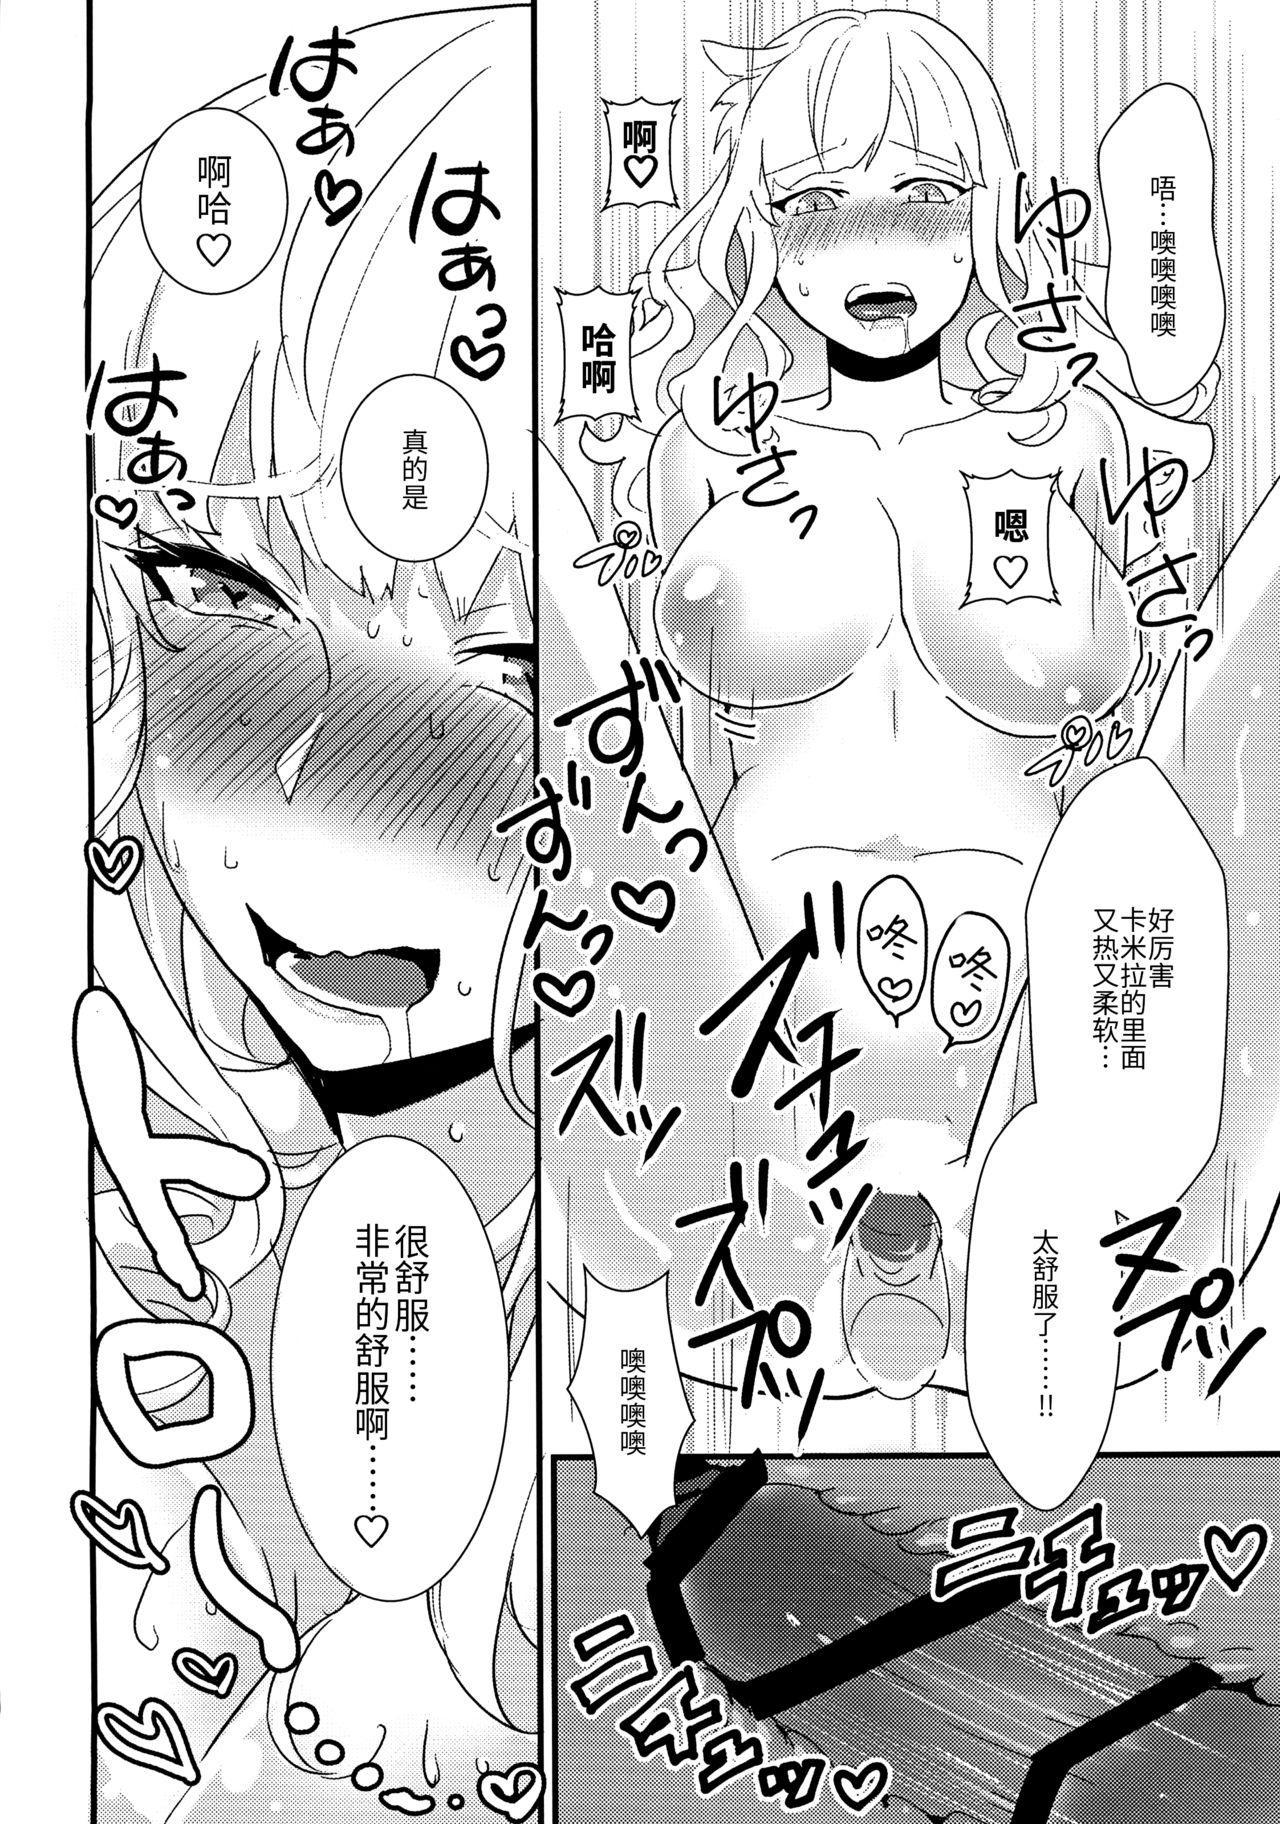 Carmilla-san to Ichaicha Shitai! 15